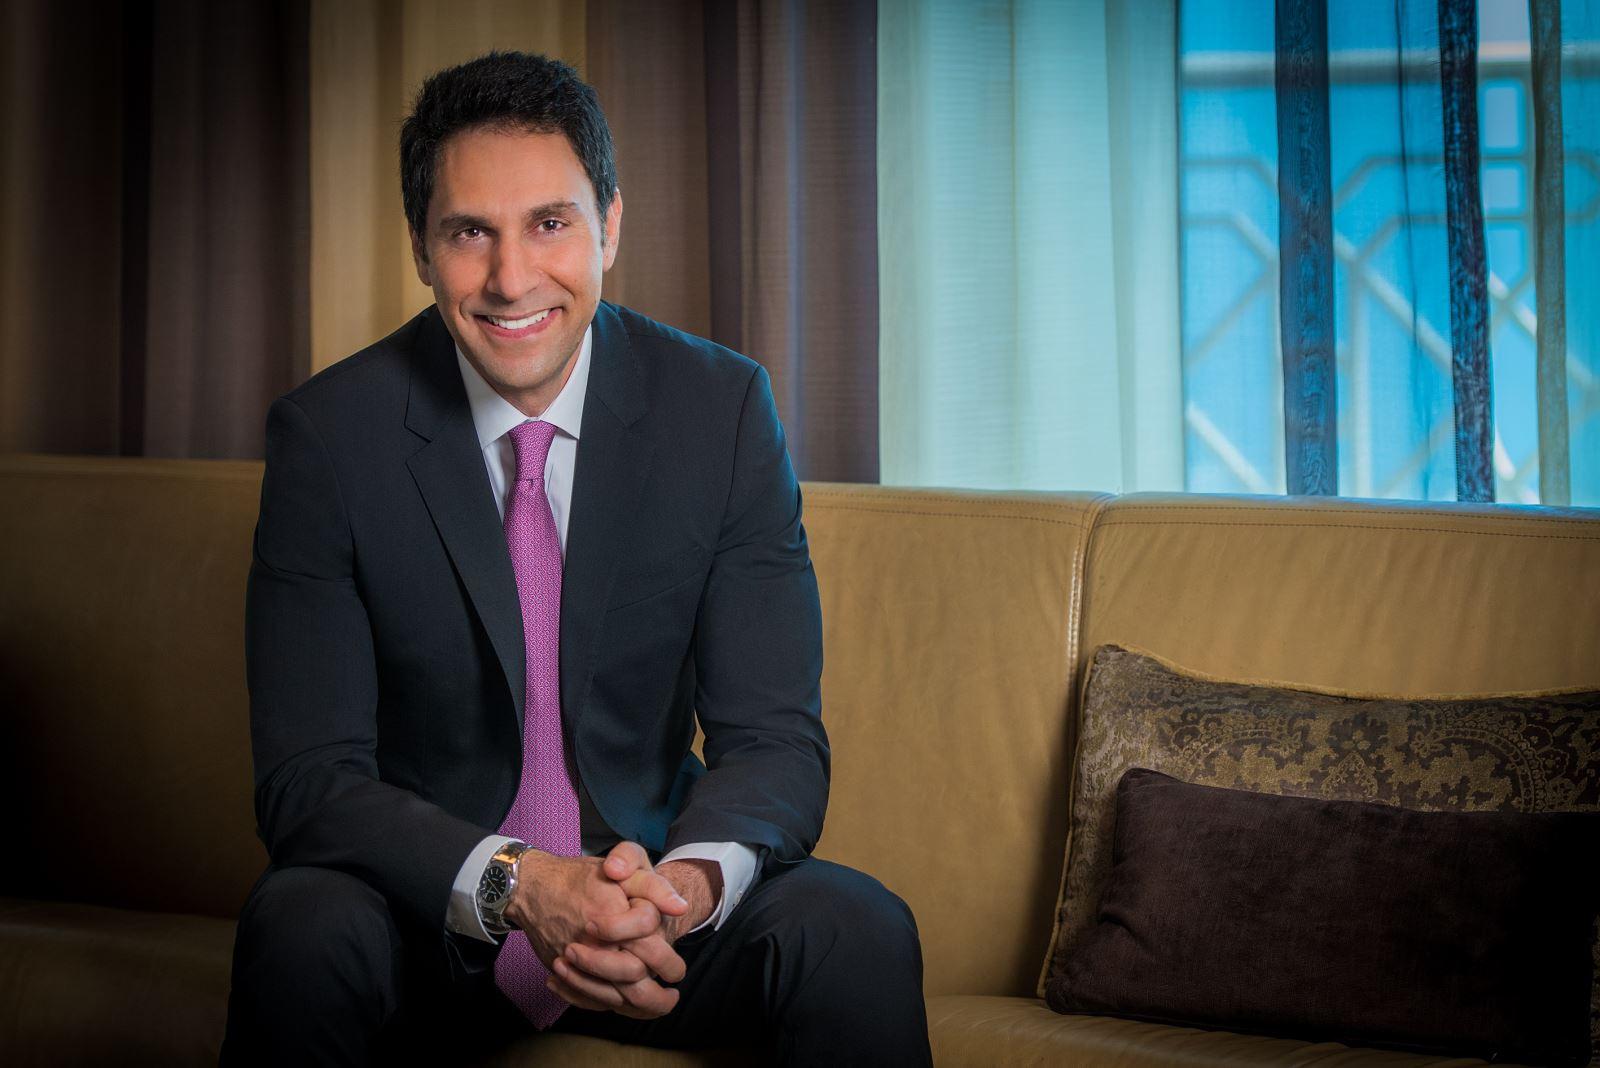 Haitham Mattar, CEO of Ras Al Khaimah Tourism Development Authority